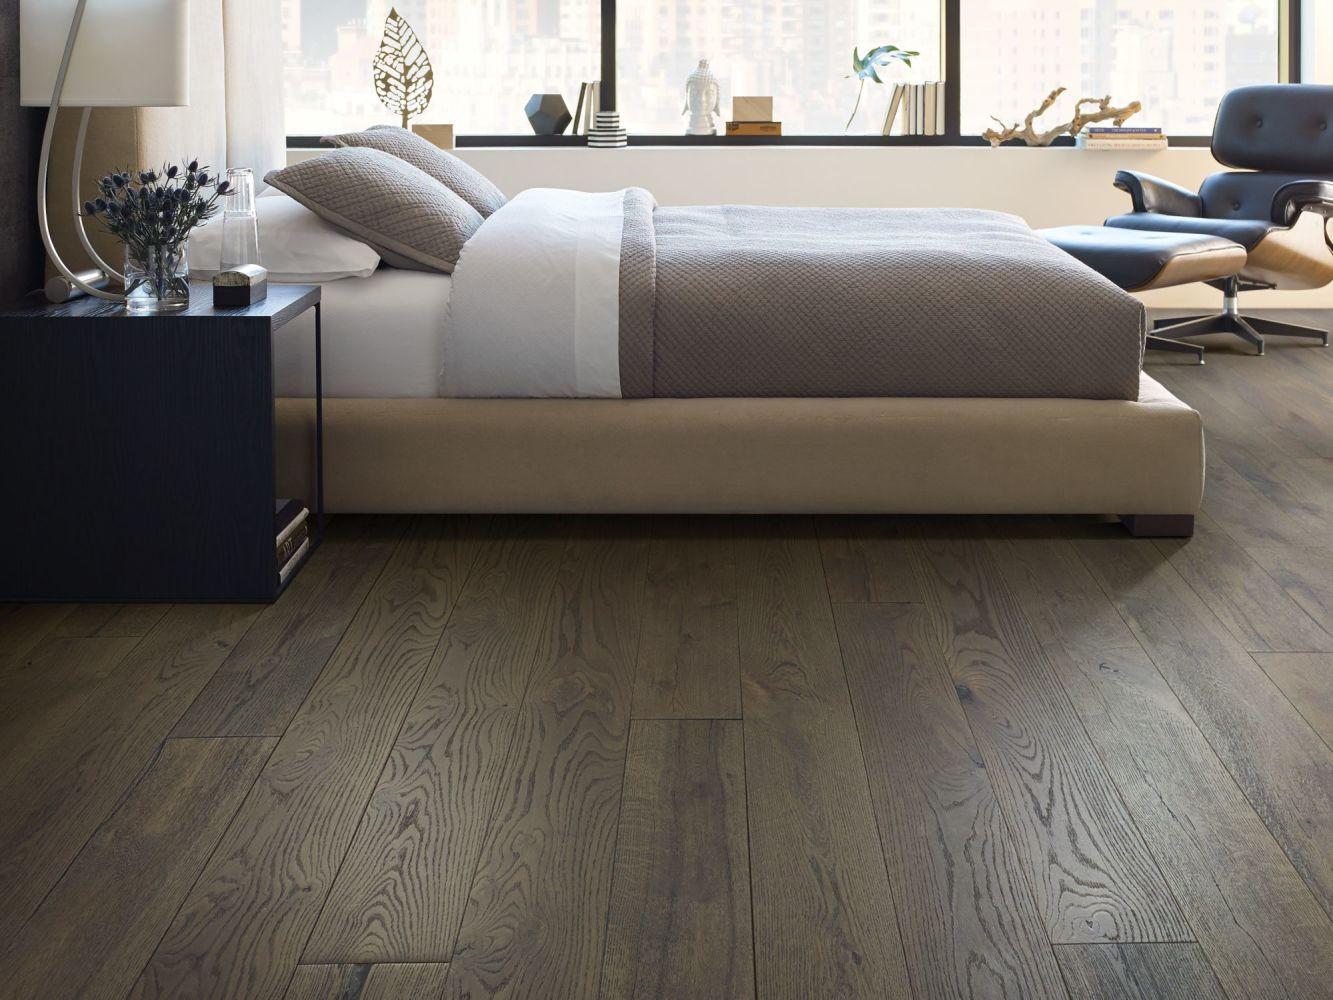 Shaw Floors Reality Homes Imagination Oak Terrain 07029_209RH